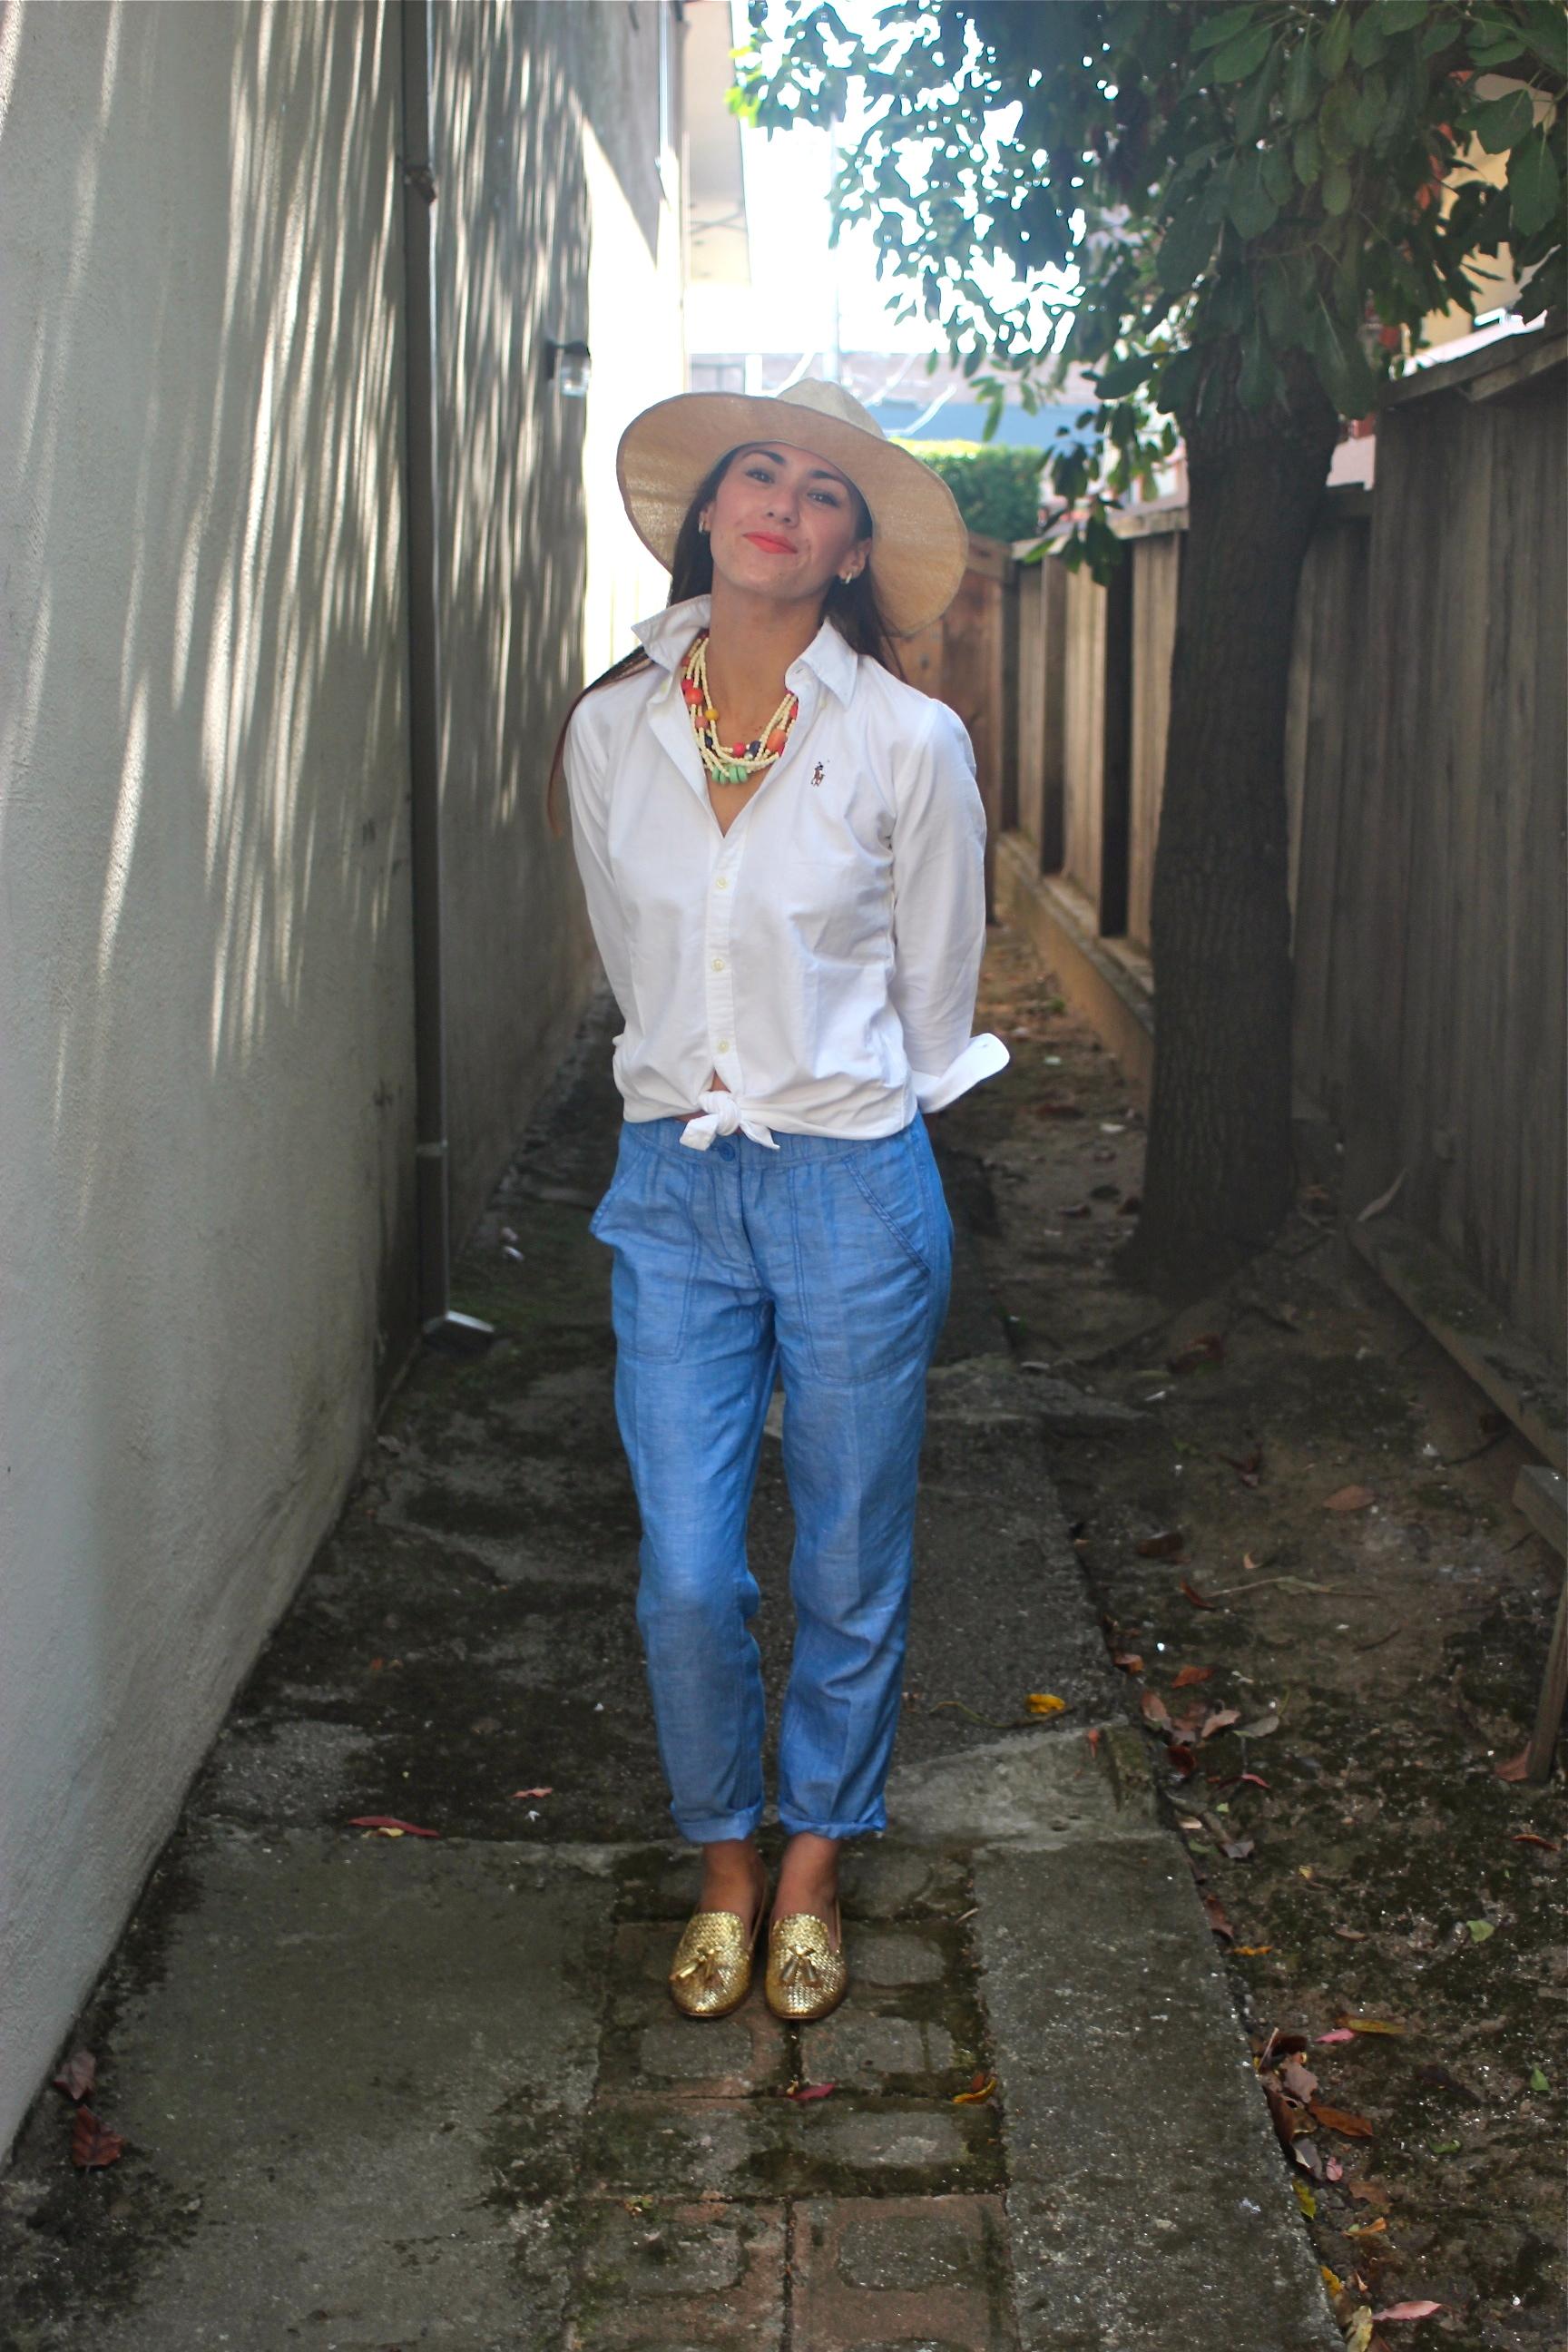 Hat: Sway ; Shirt: Ralph Lauren; Pants: J.Crew; Shoes: Prada; Necklace: Vintage, circa 1980s